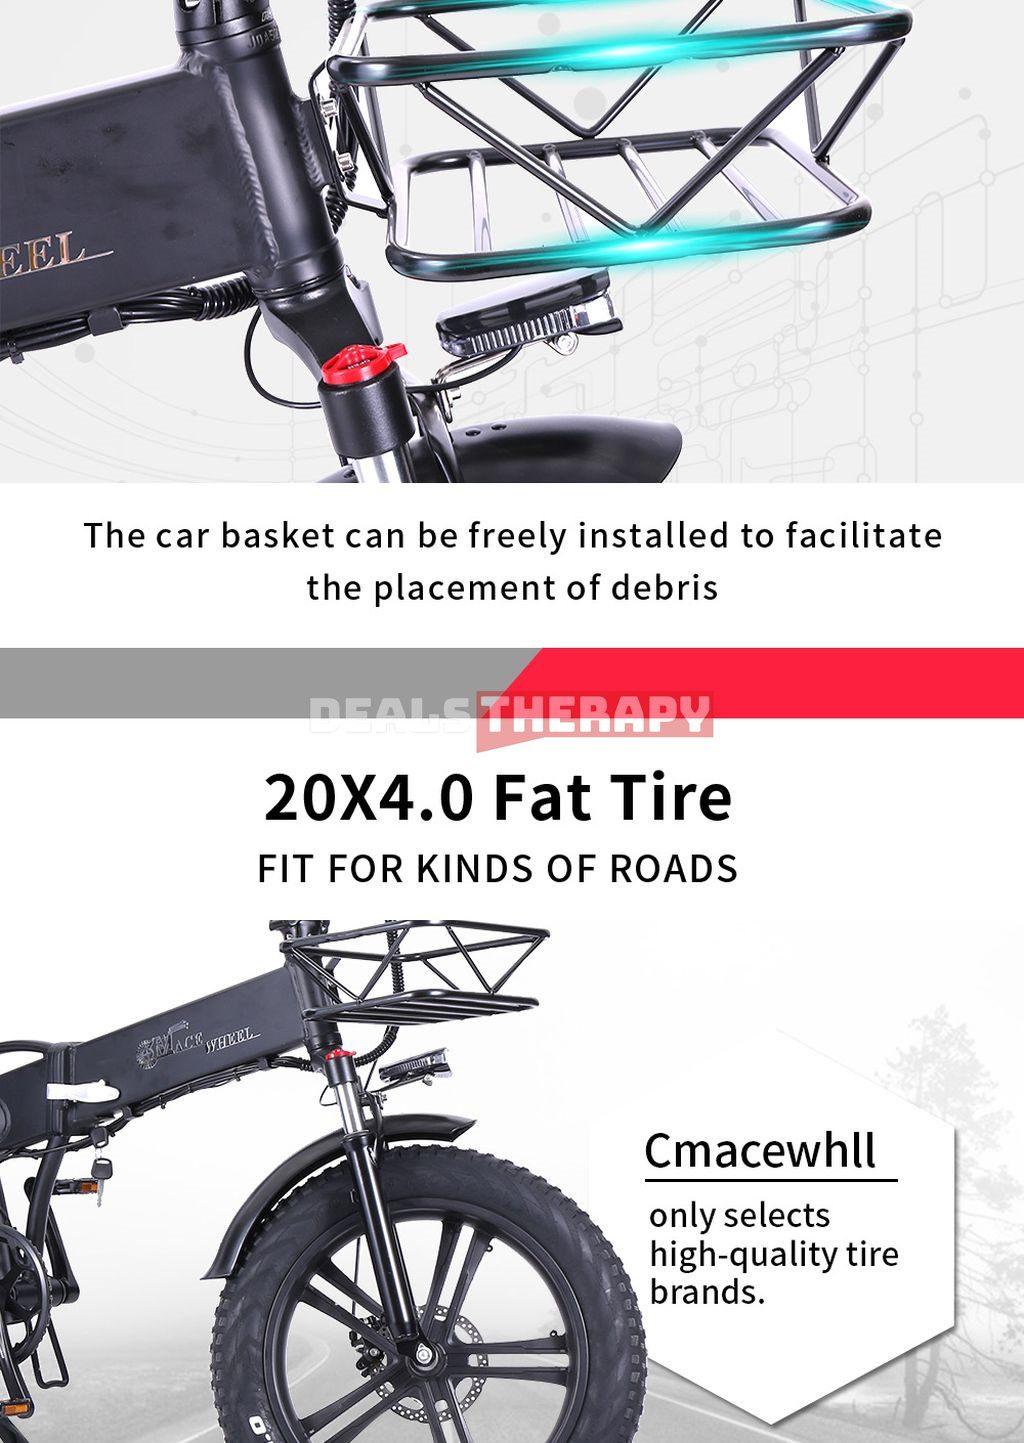 CMACEWHEEL GT20 Pro